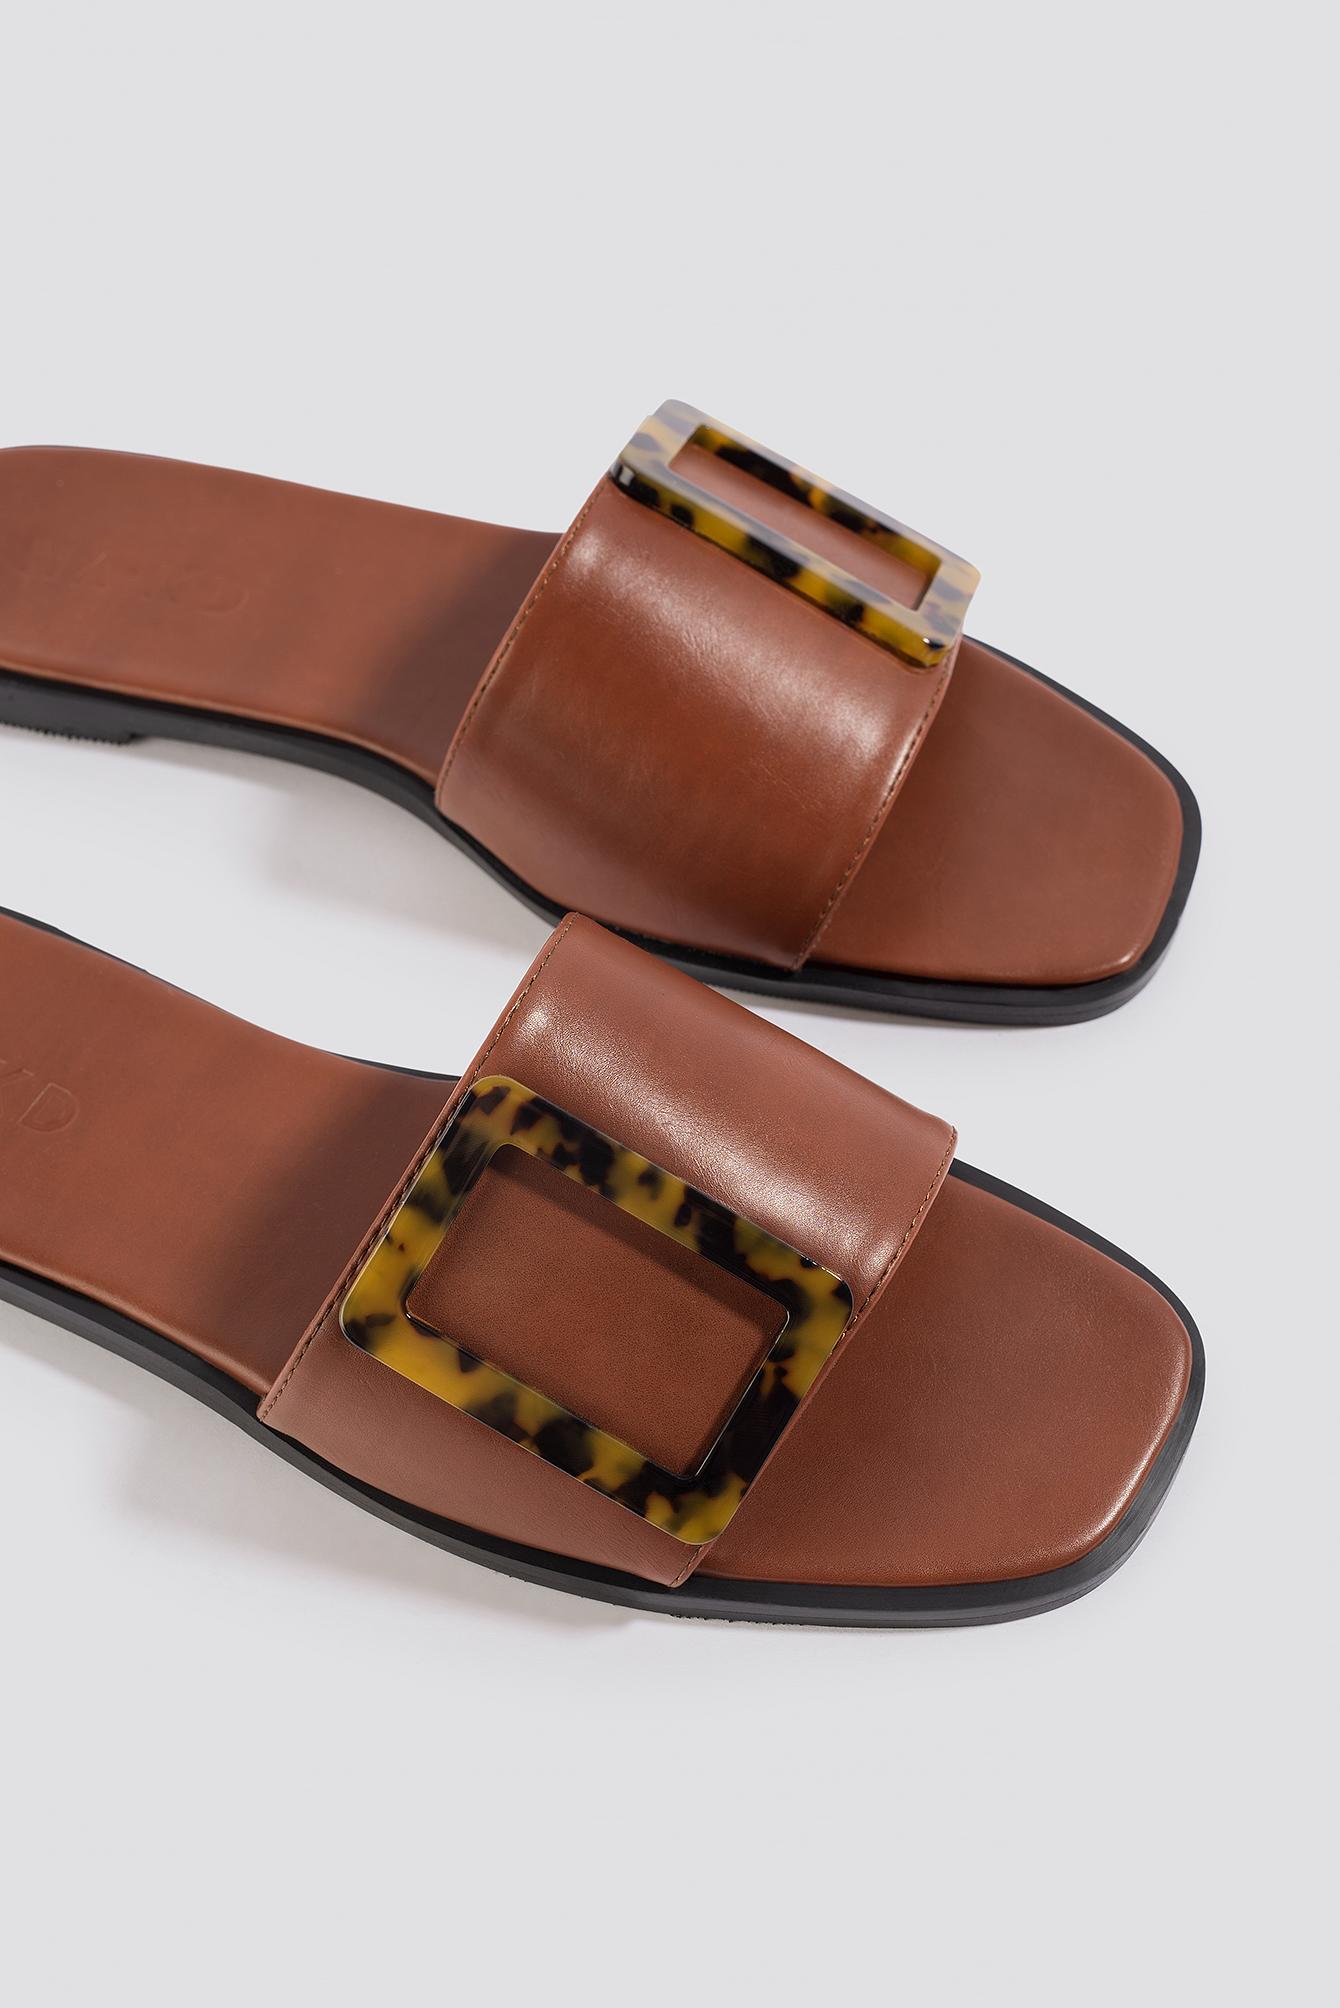 na-kd shoes -  Big Buckle Flats - Brown